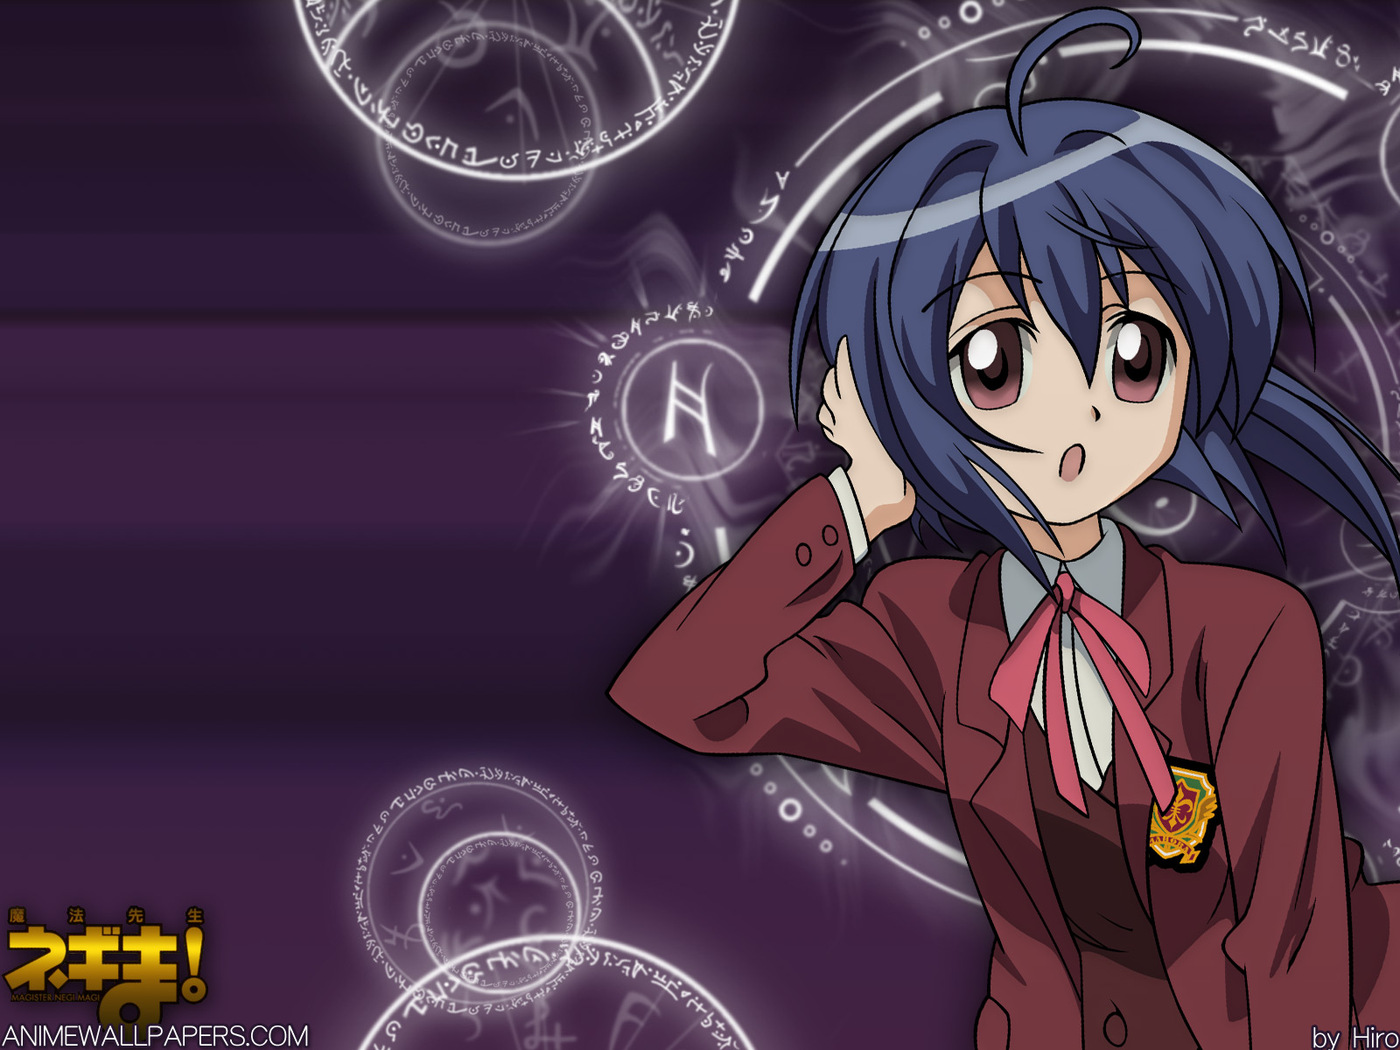 Negima Anime Wallpaper # 18